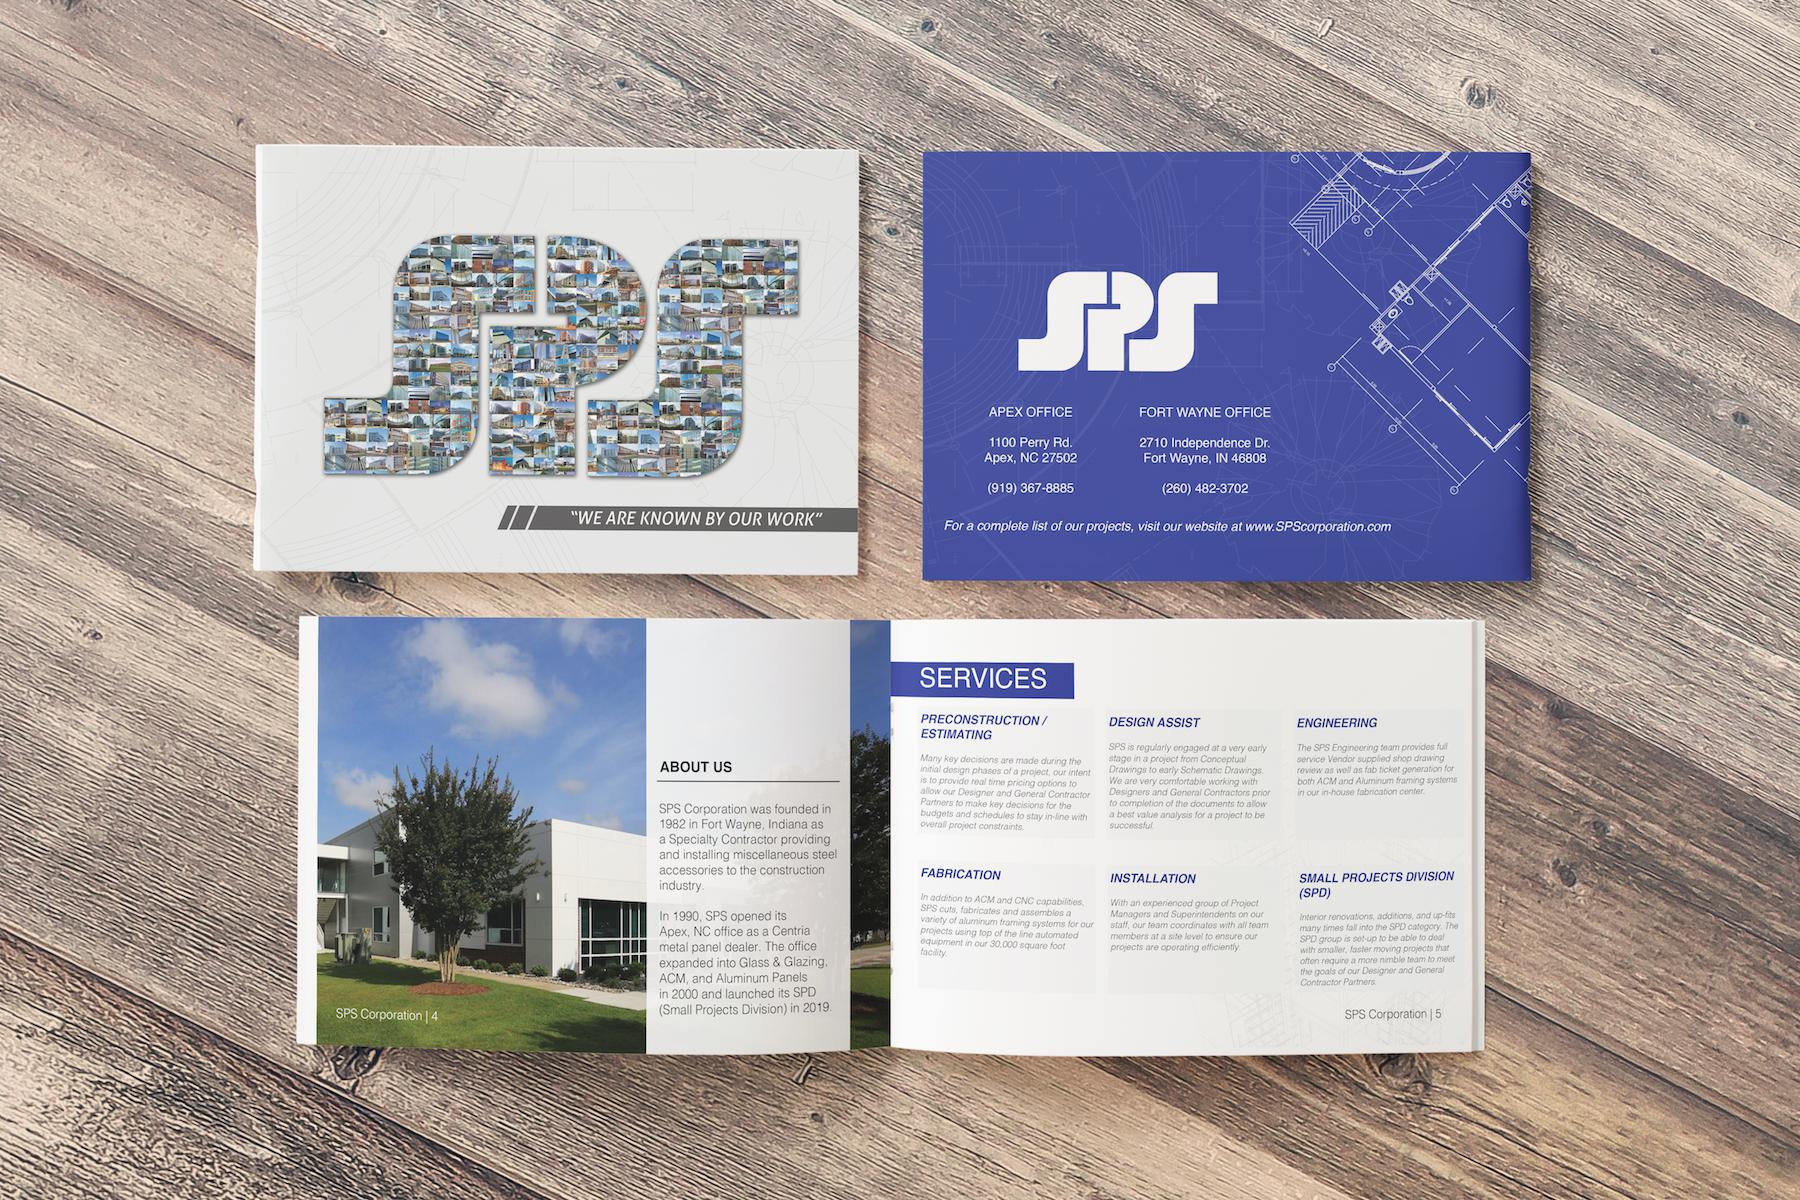 SPS Corporation Viewbook